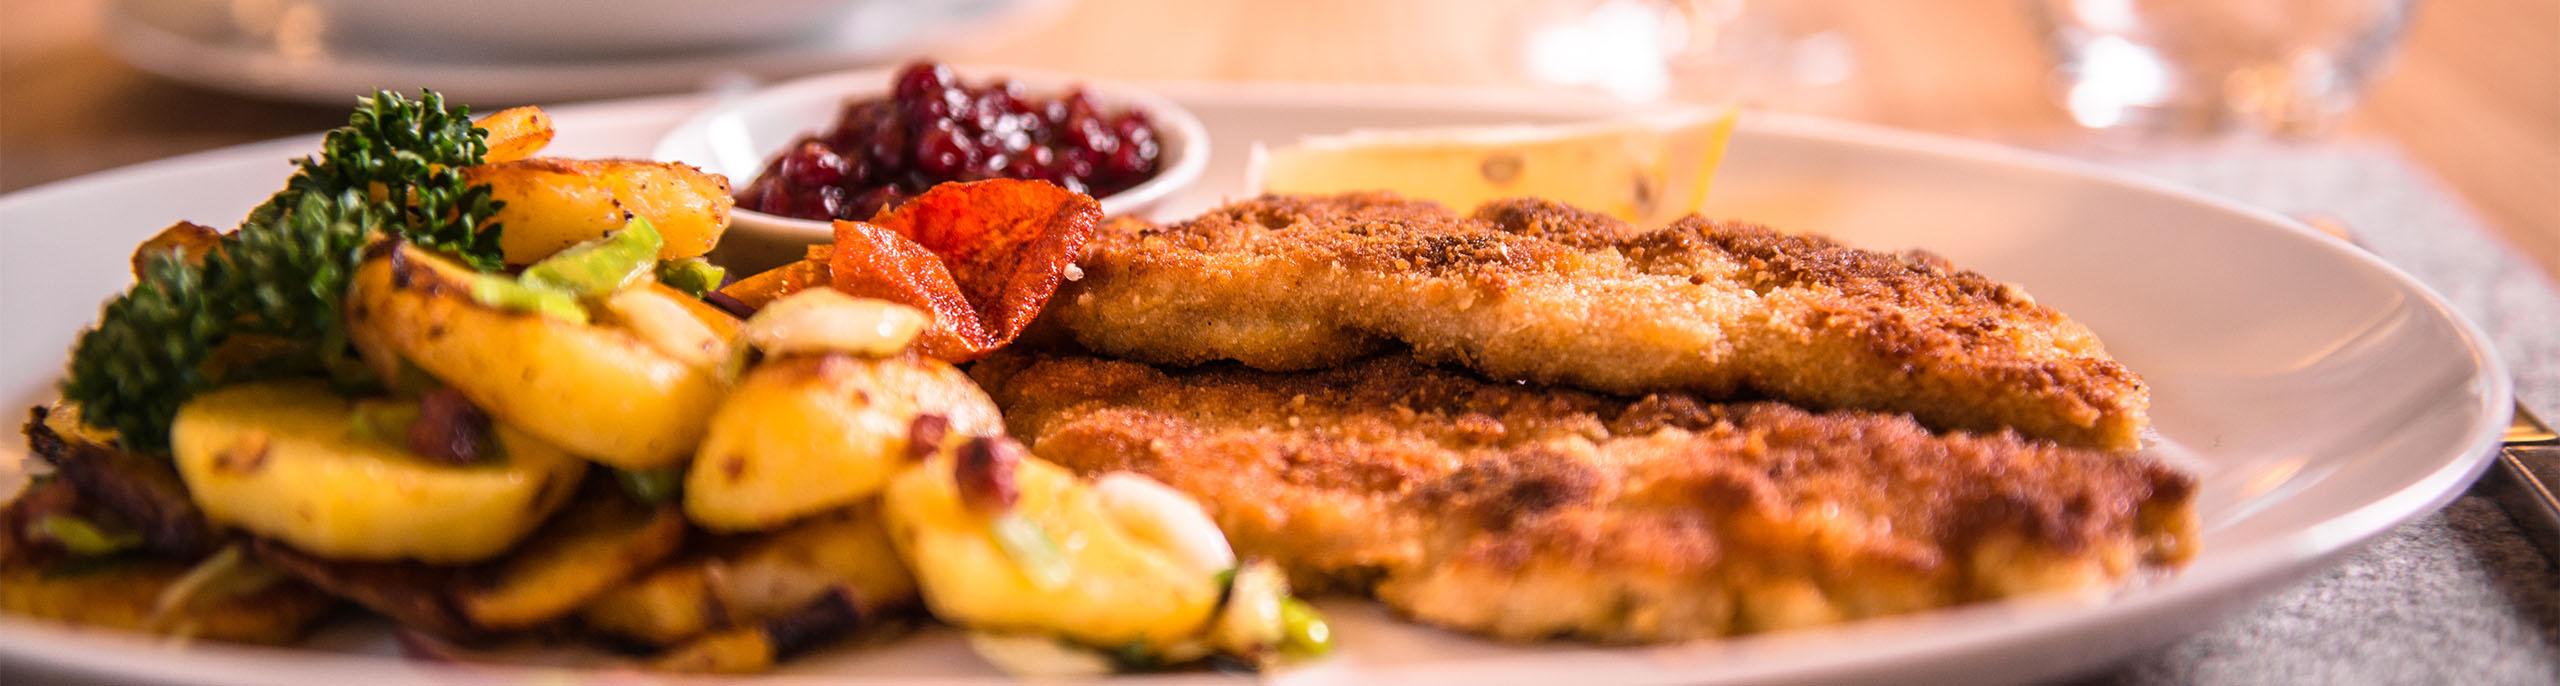 Frühjahrsdult Landshut - Wiener Schnitzel mit Kartoffelsalat, mhh lecker